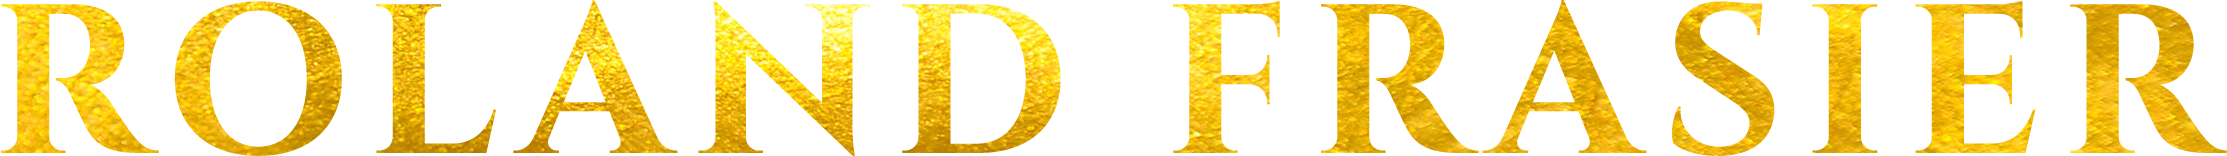 Roland Frasier Logo - EquiJuri